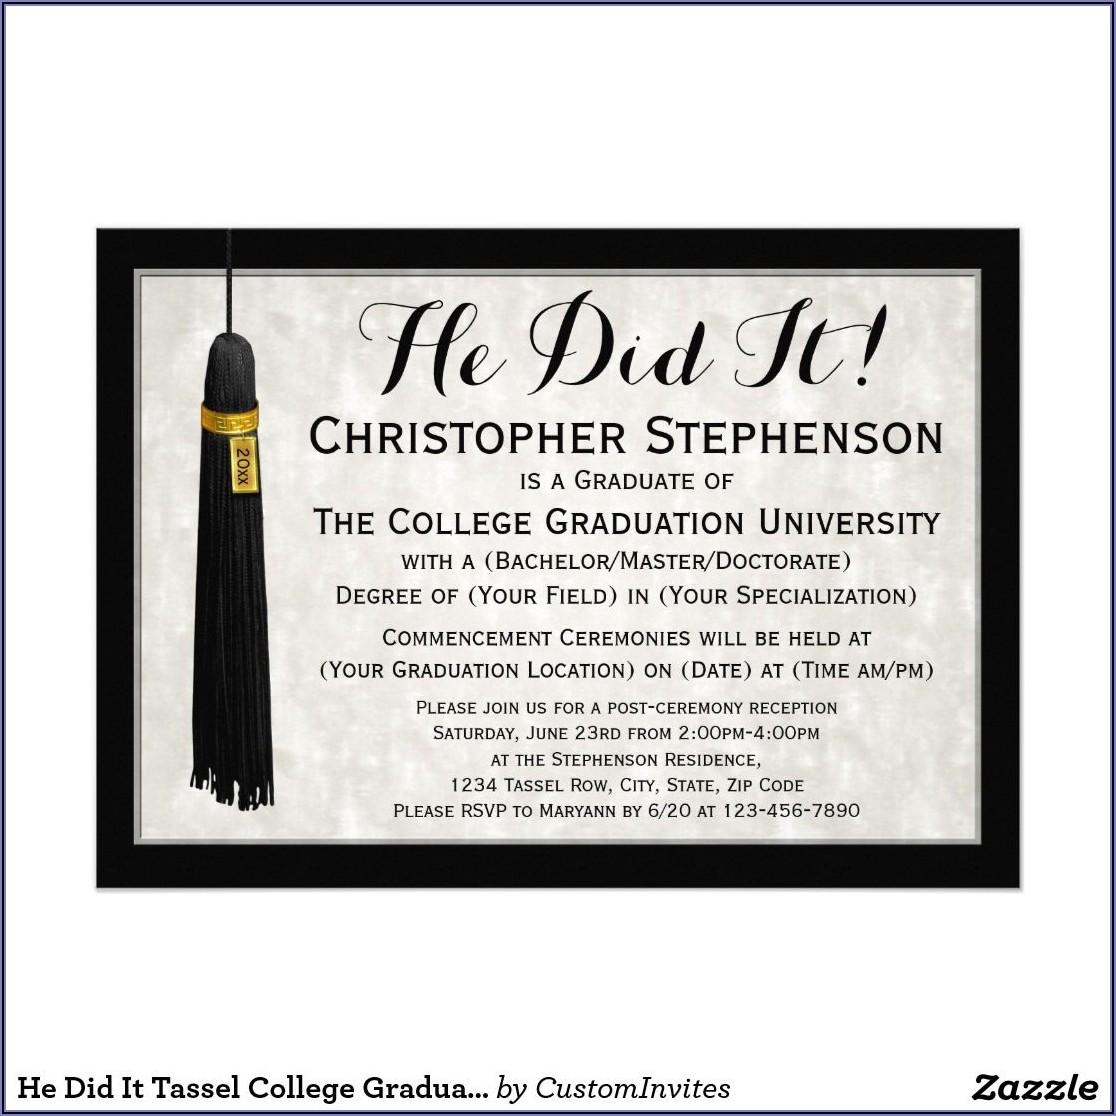 Office Depot College Graduation Announcements